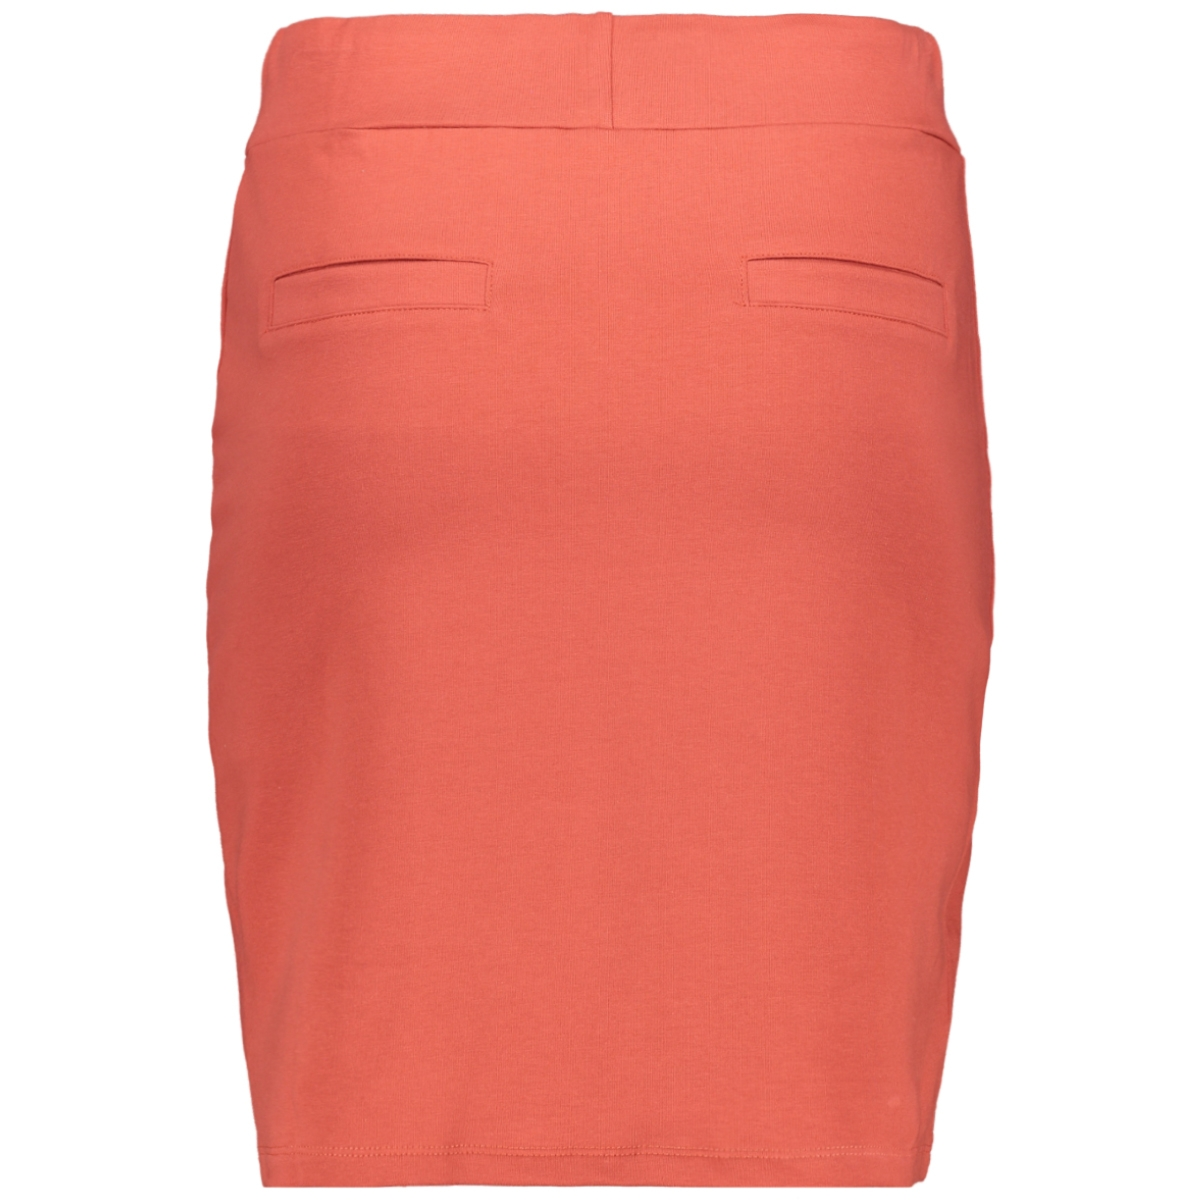 jessie skirt with buttons 201 zoso rok desert red